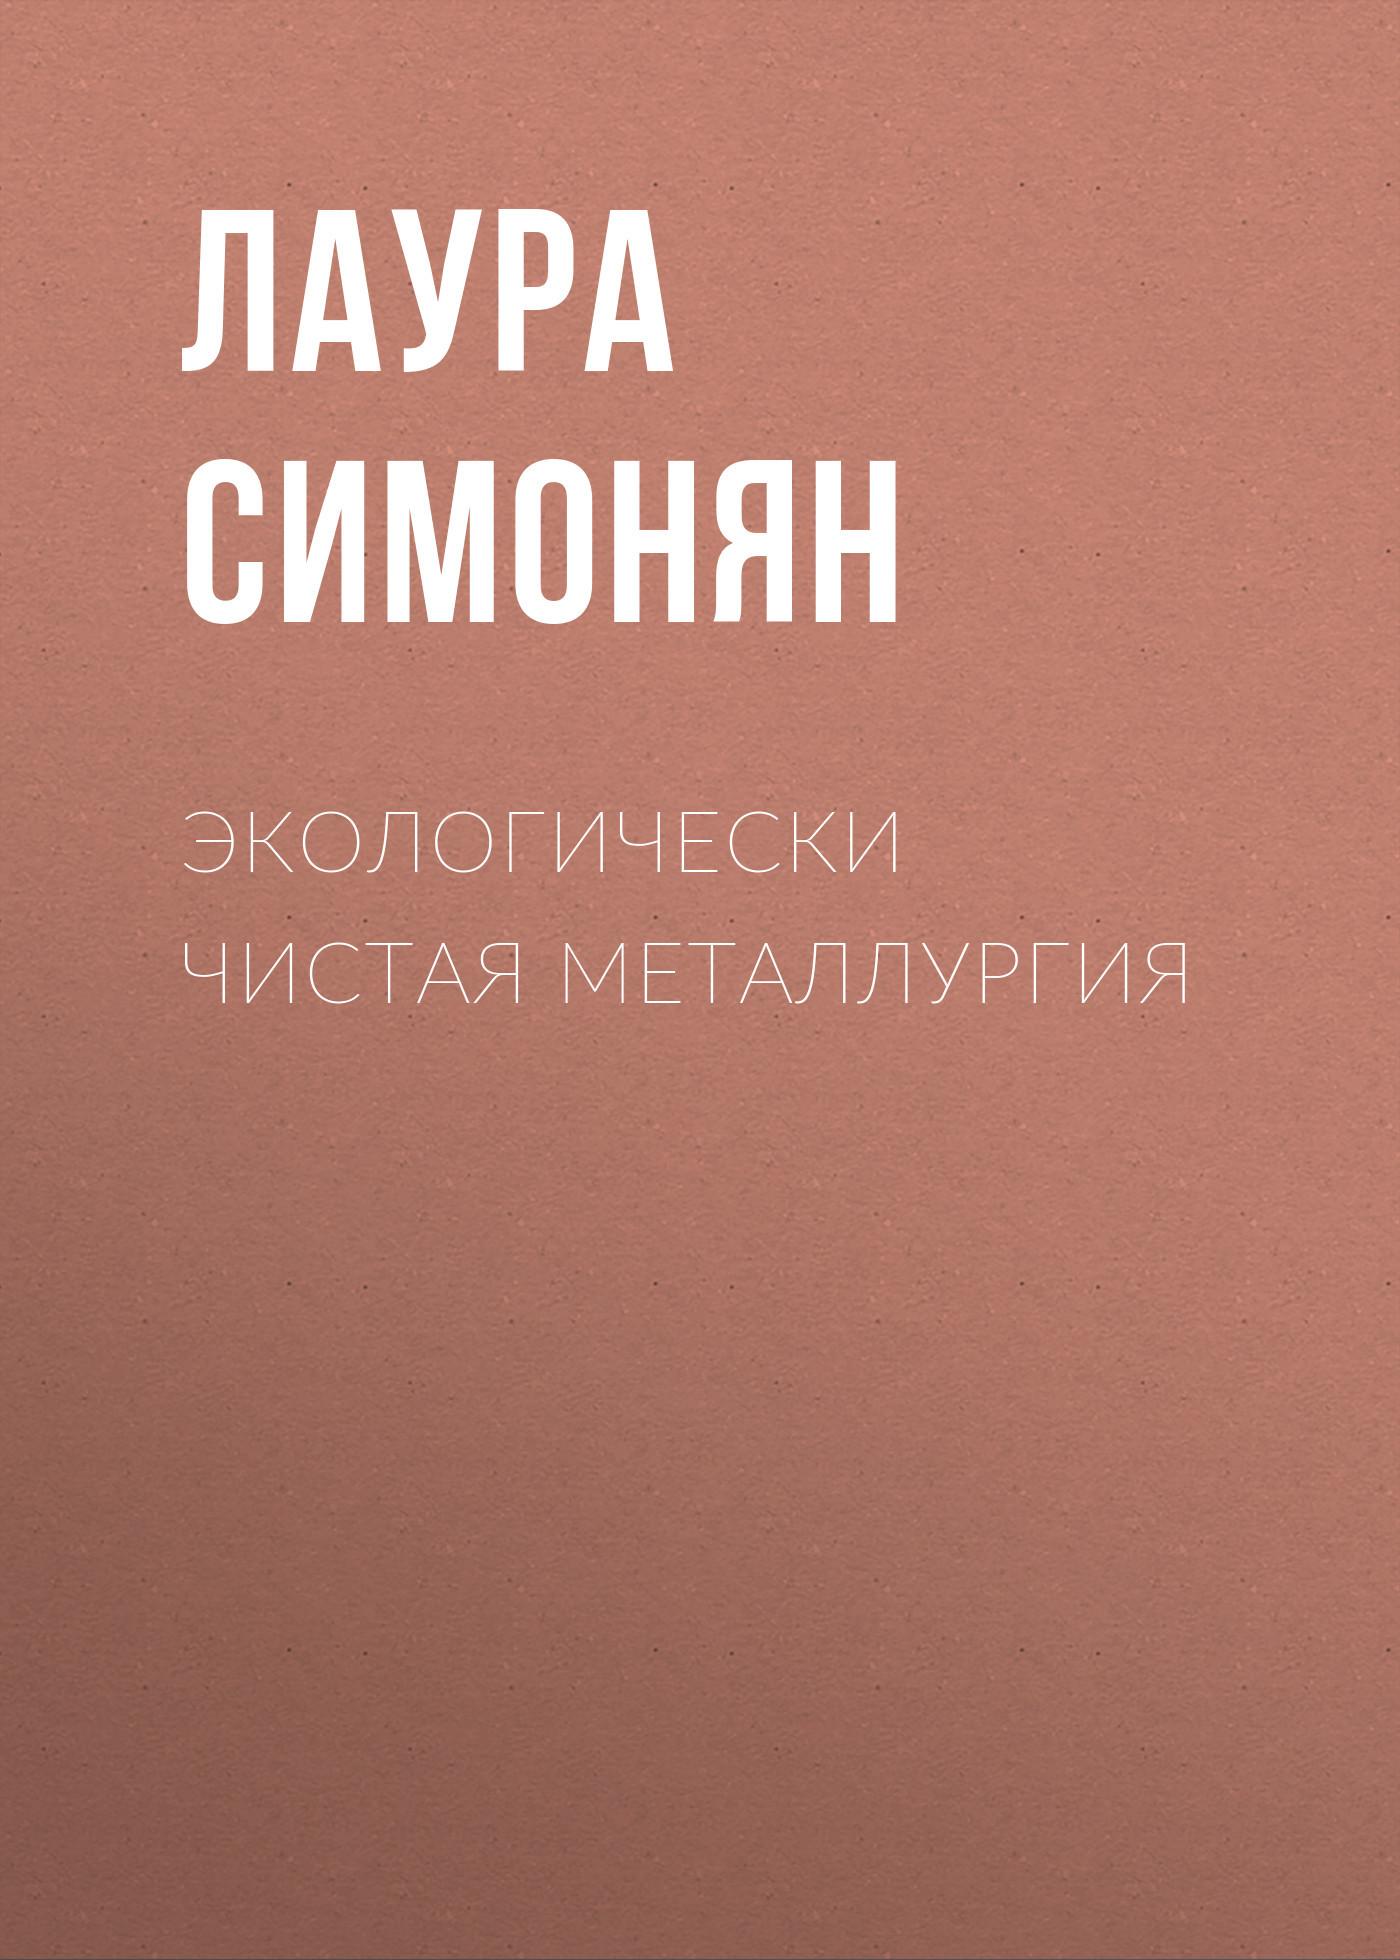 Лаура Симонян Экологически чистая металлургия